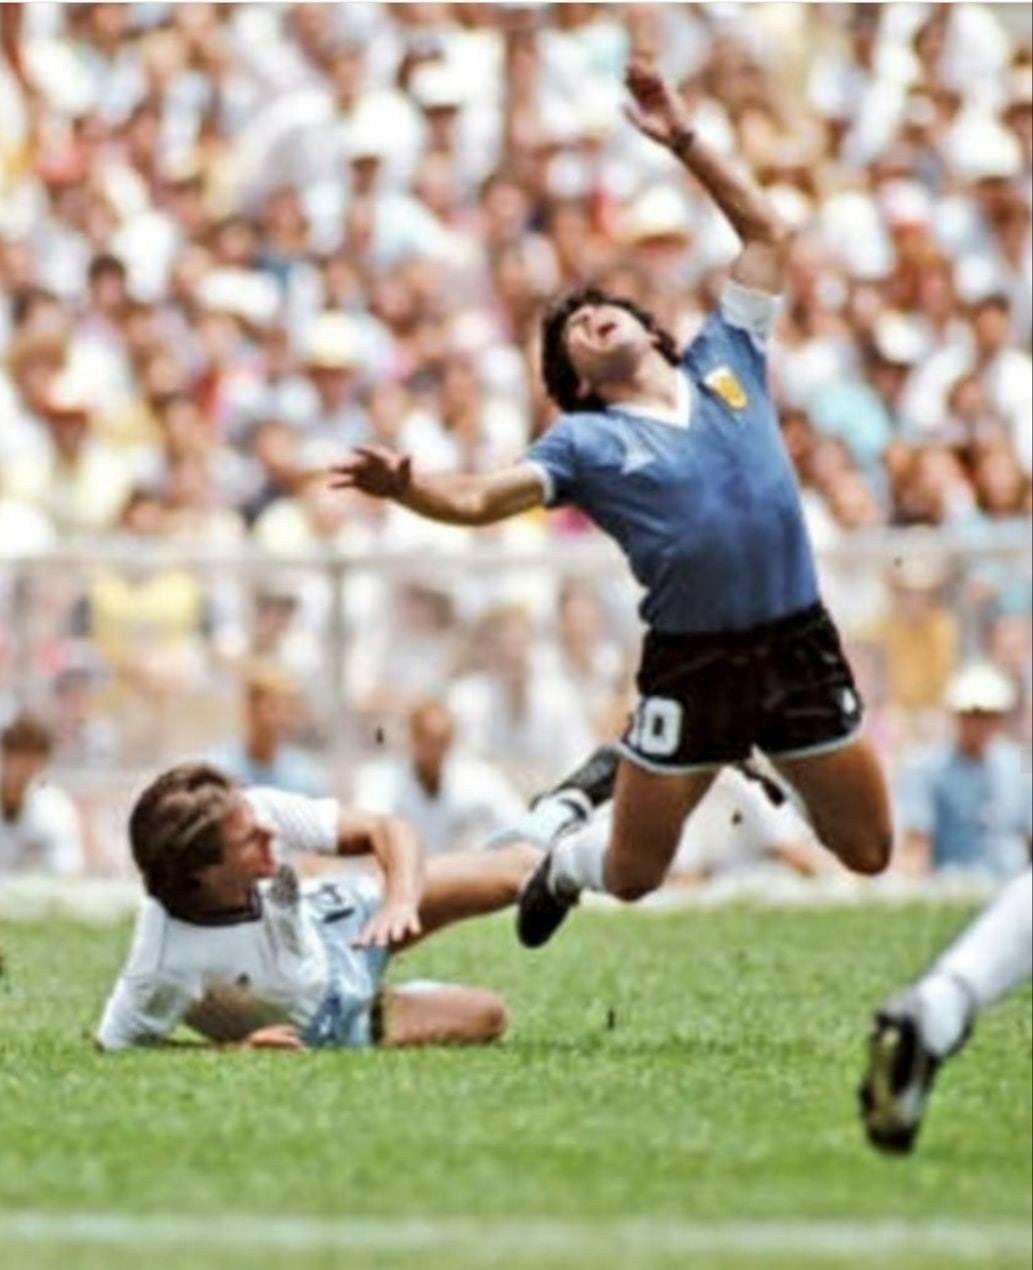 Diego Argentina Vs Inglaterra 1986 En 2020 Diego Maradona Fotos Argentina